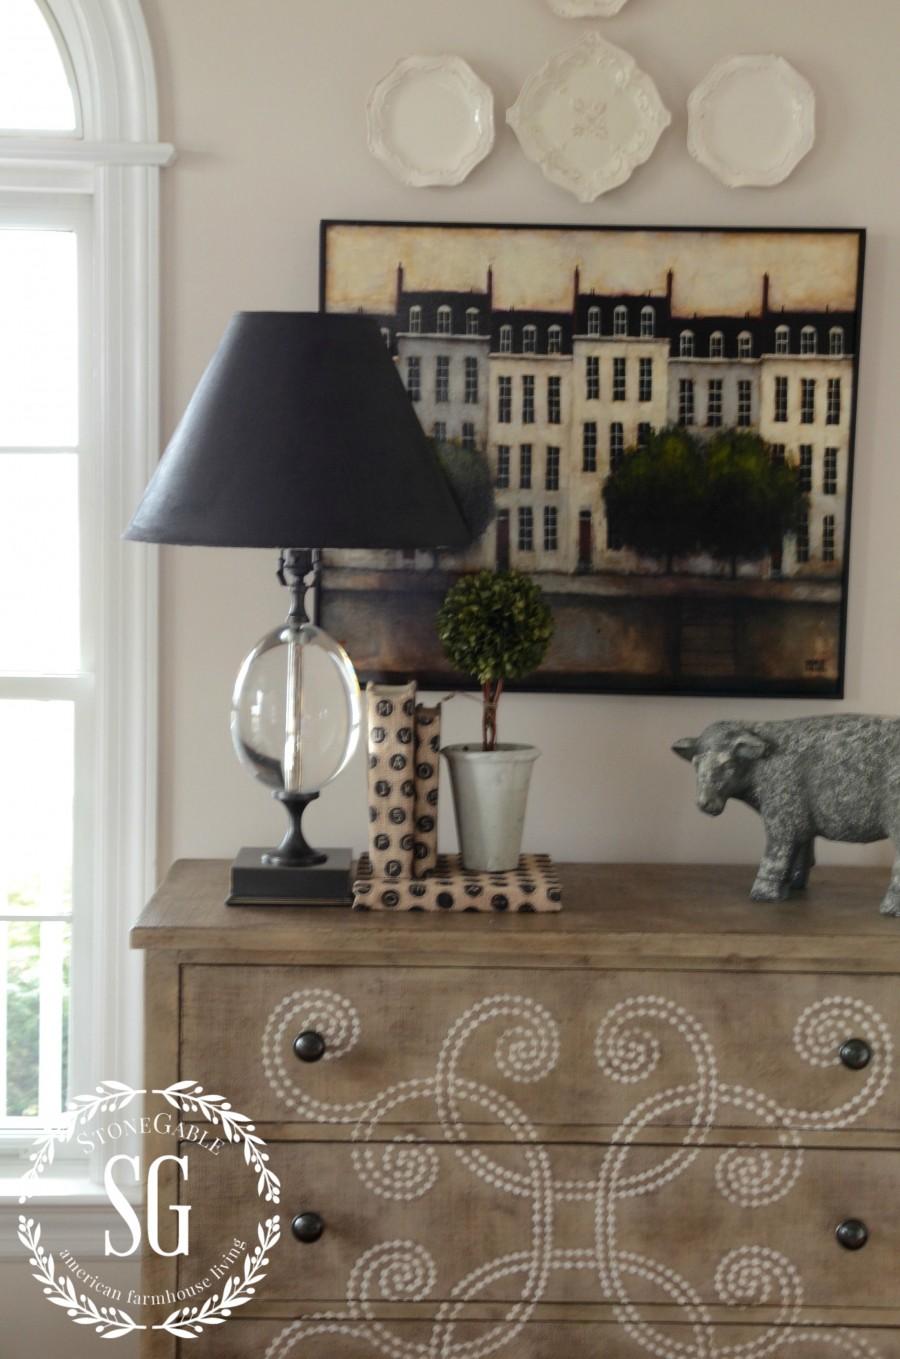 Upcycling A Lamp Shade Using Paint Stonegable